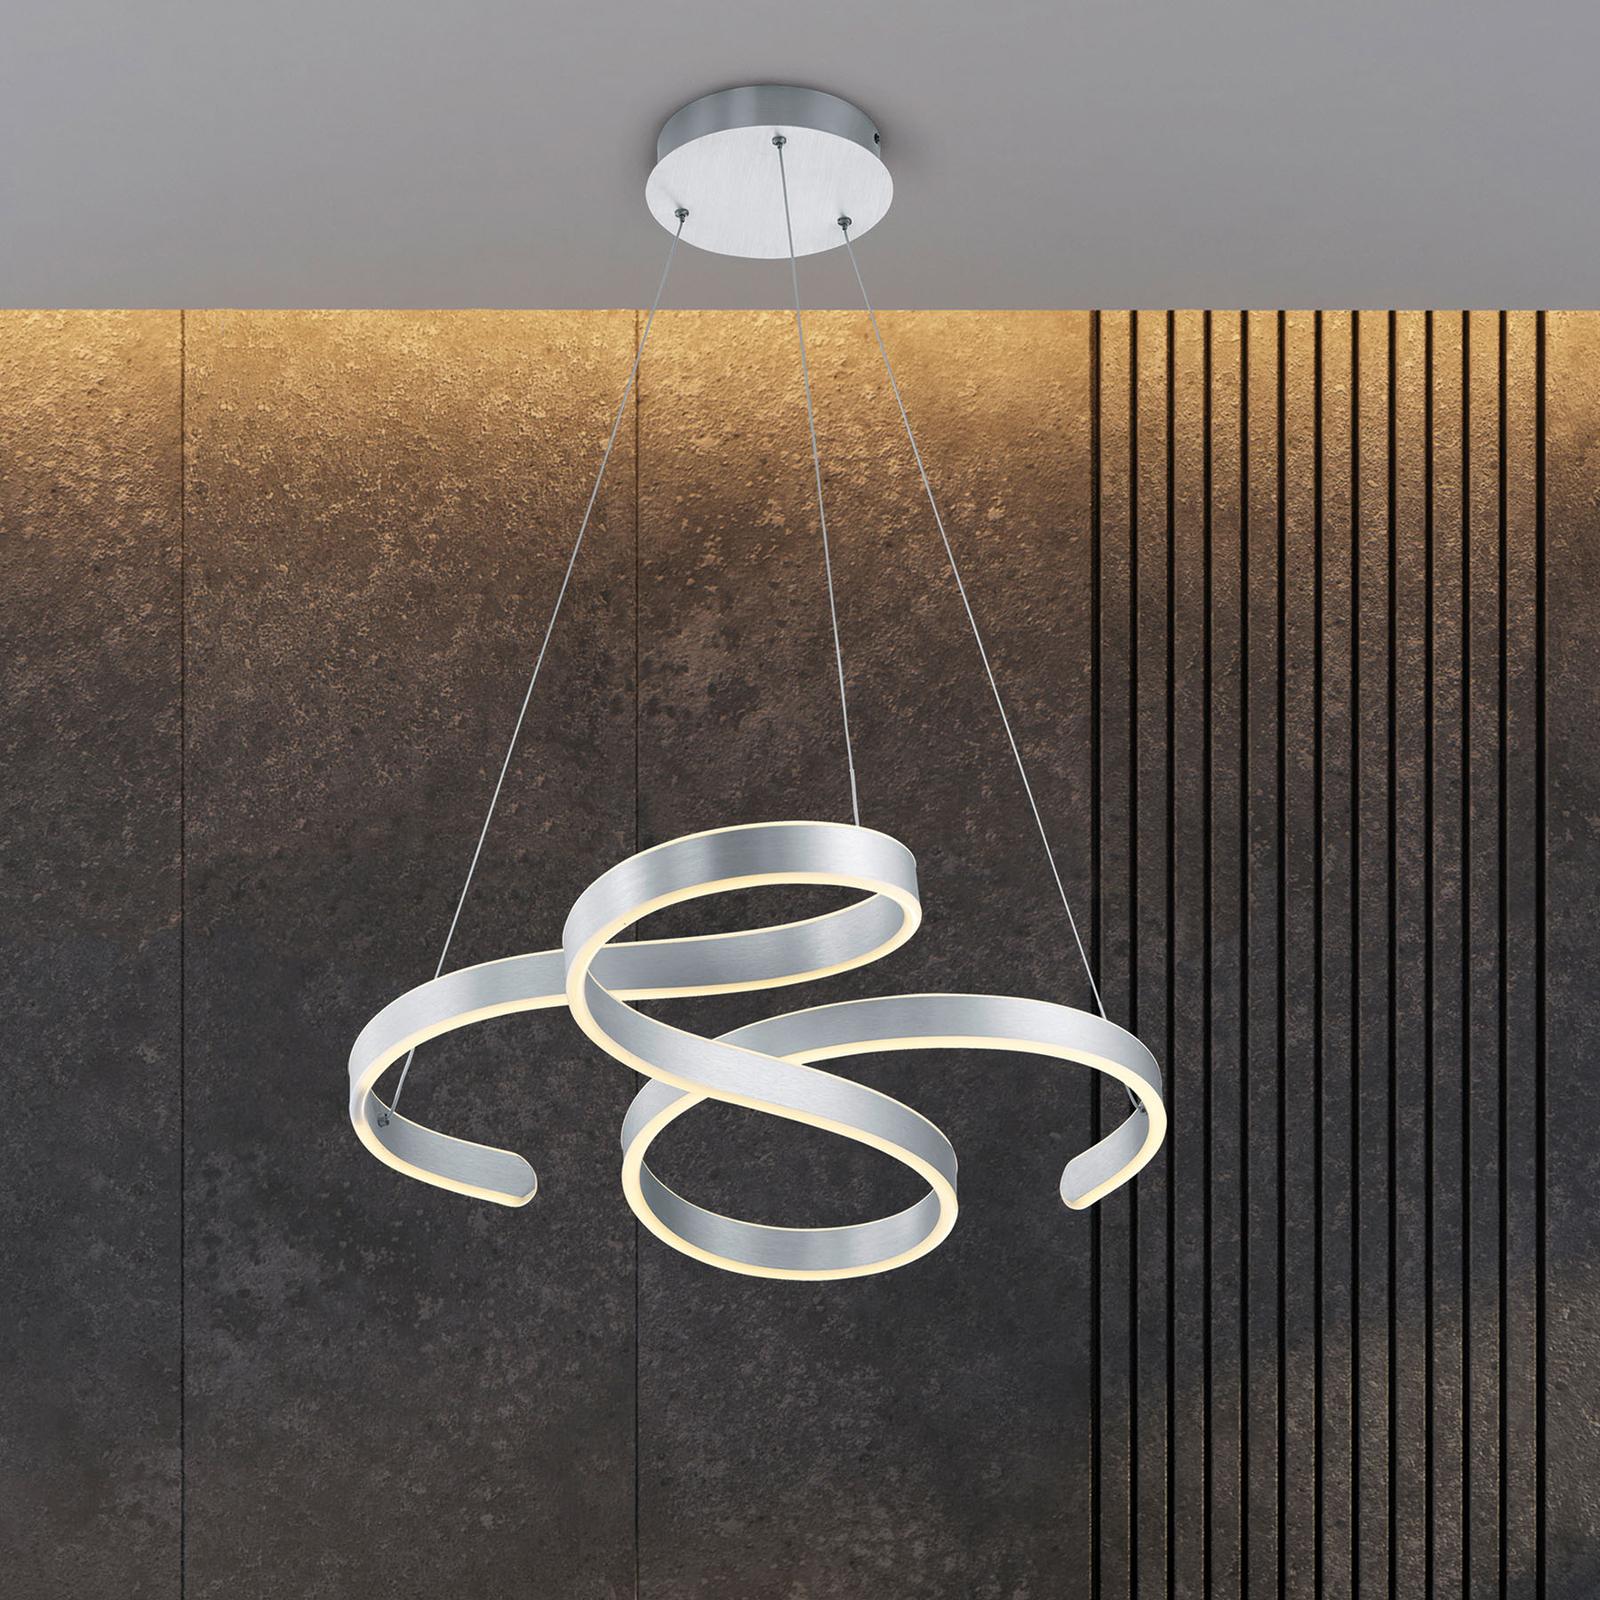 LED-riippuvalaisin Francis, harjattu alumiini